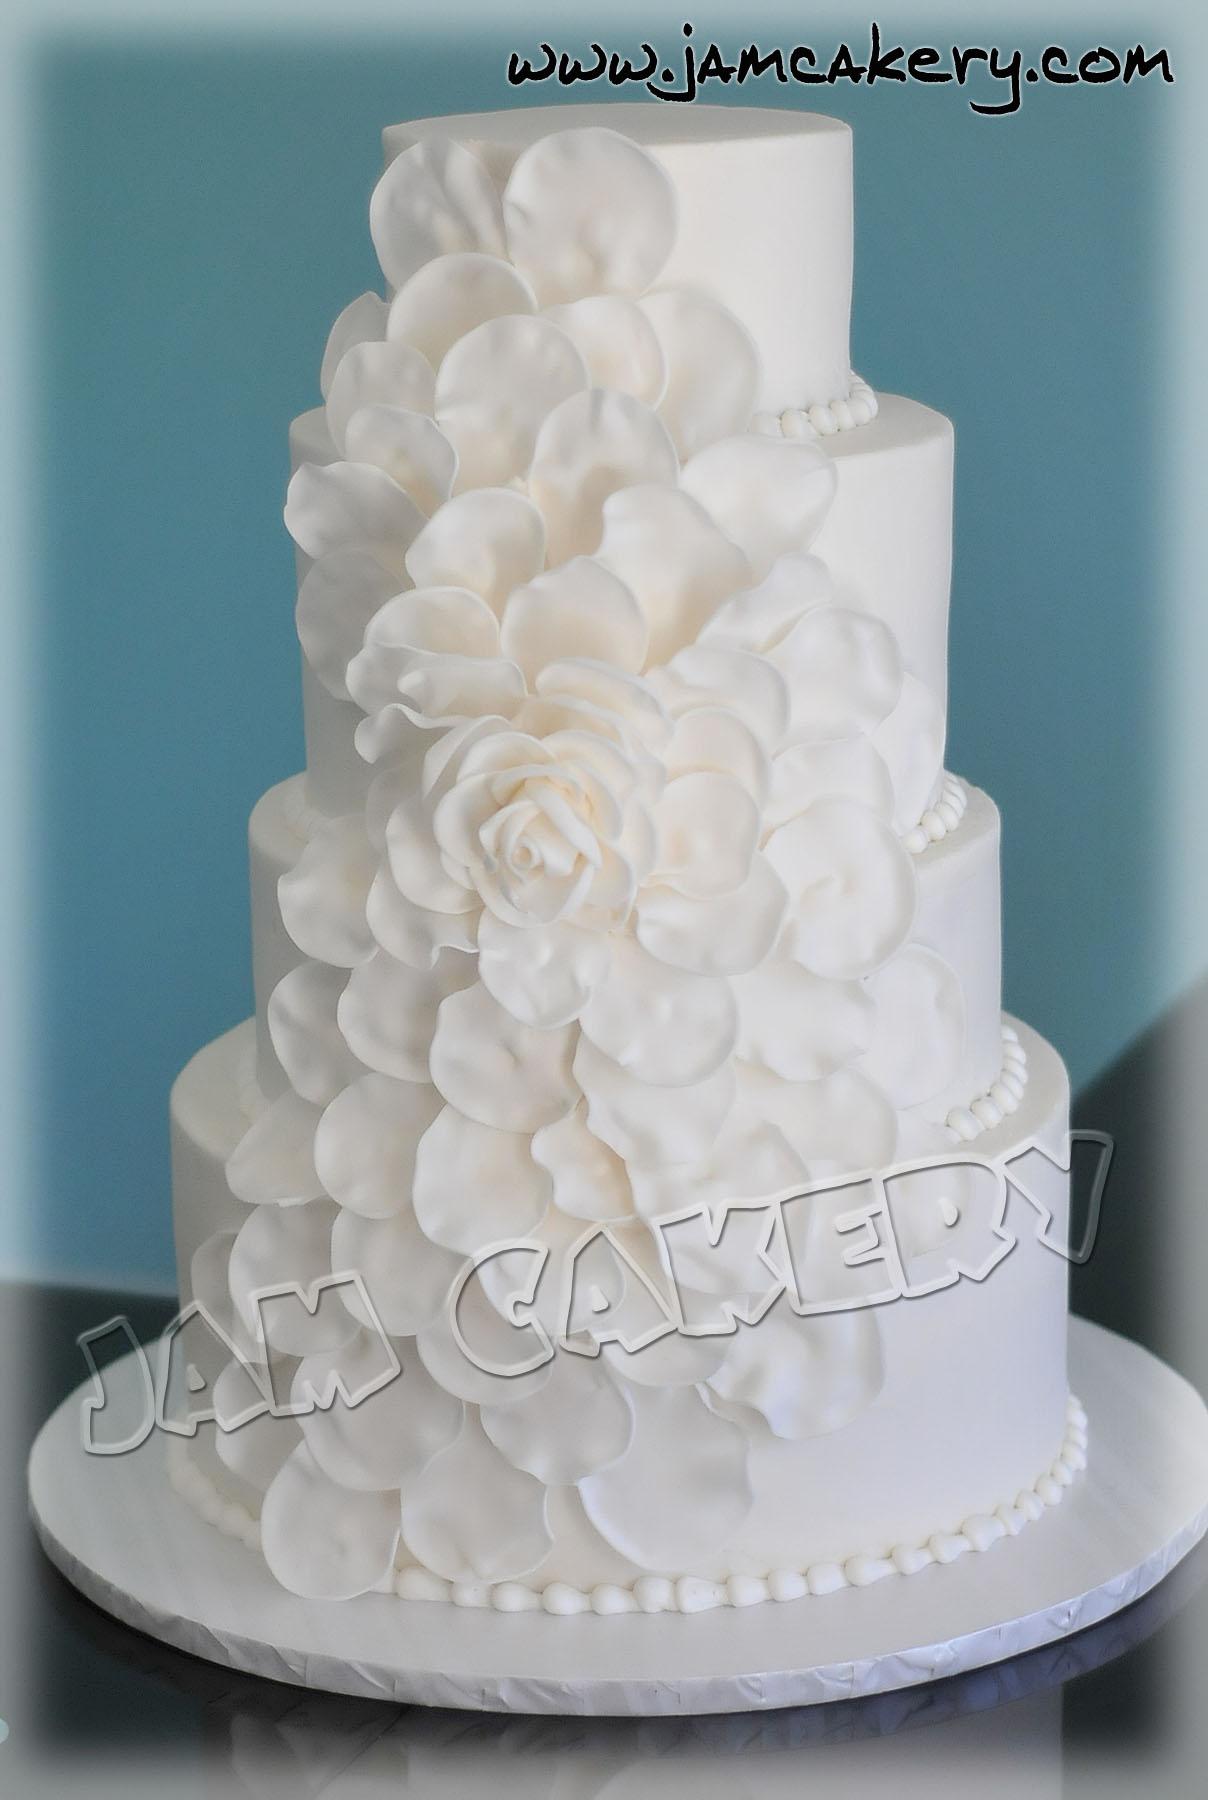 Petal Wedding Cake  JAM Cakery